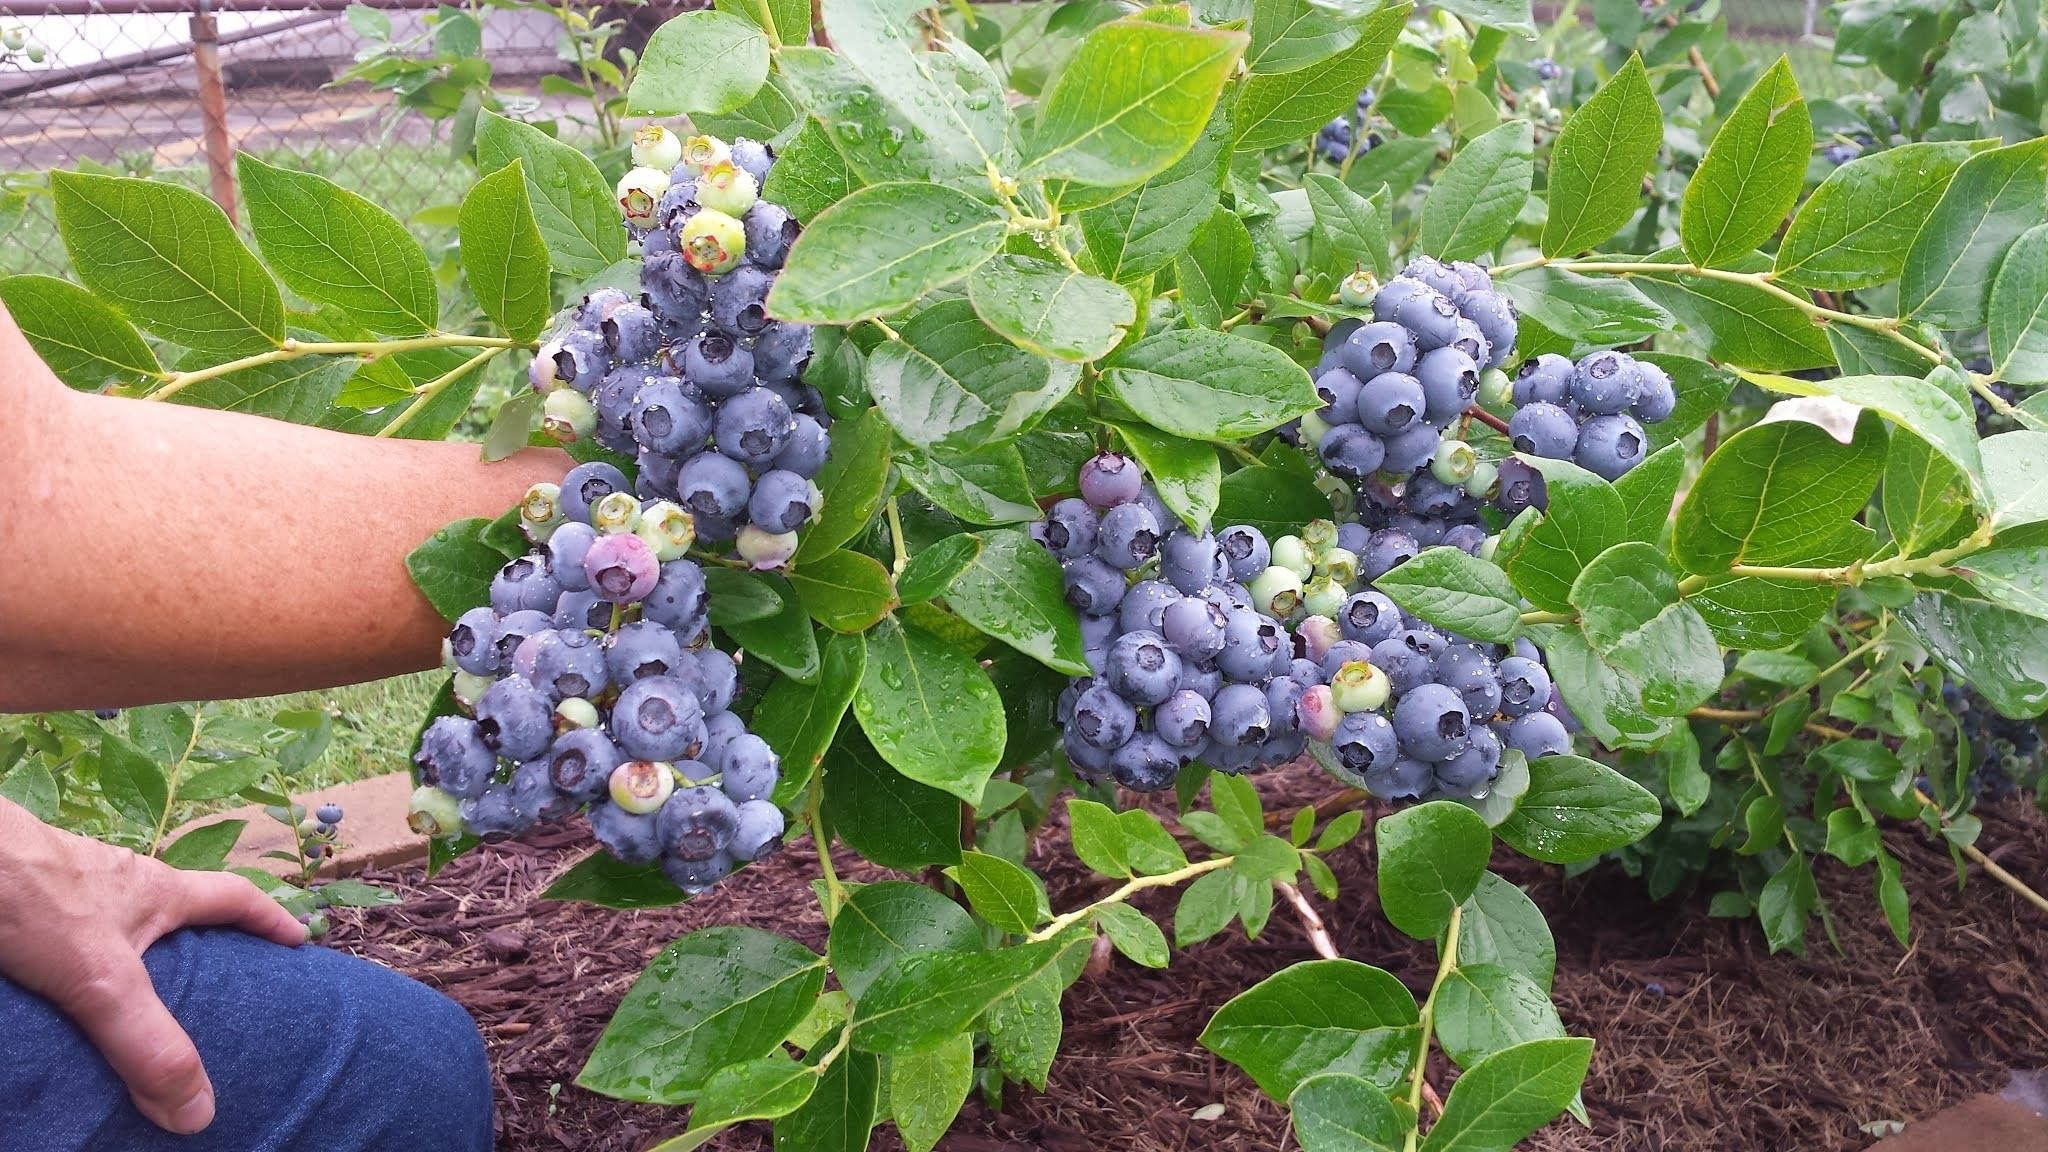 Plant Blueberry Bushes Now To Enjoy Giant Quarter Size Tasty